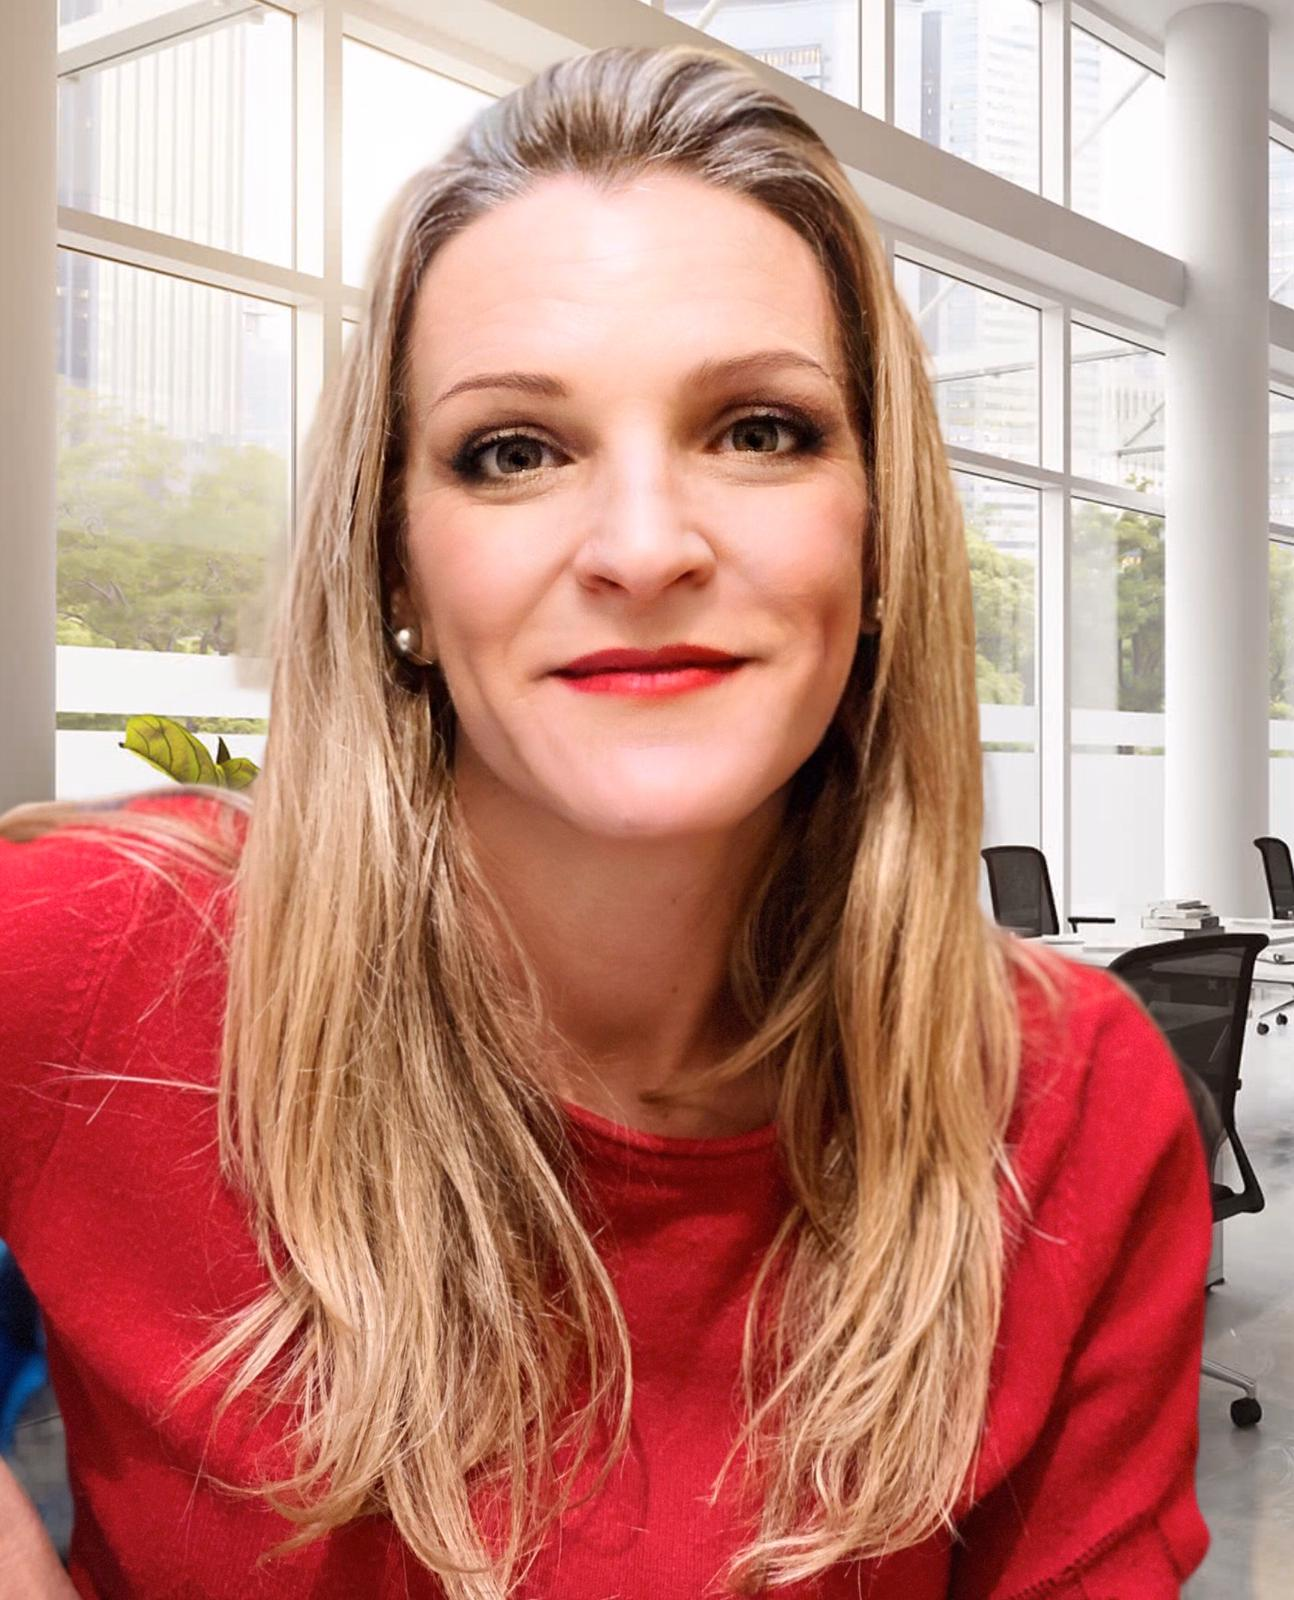 Entrevista a la portavoz del PSPV de Moncofa, Ruth Esteve